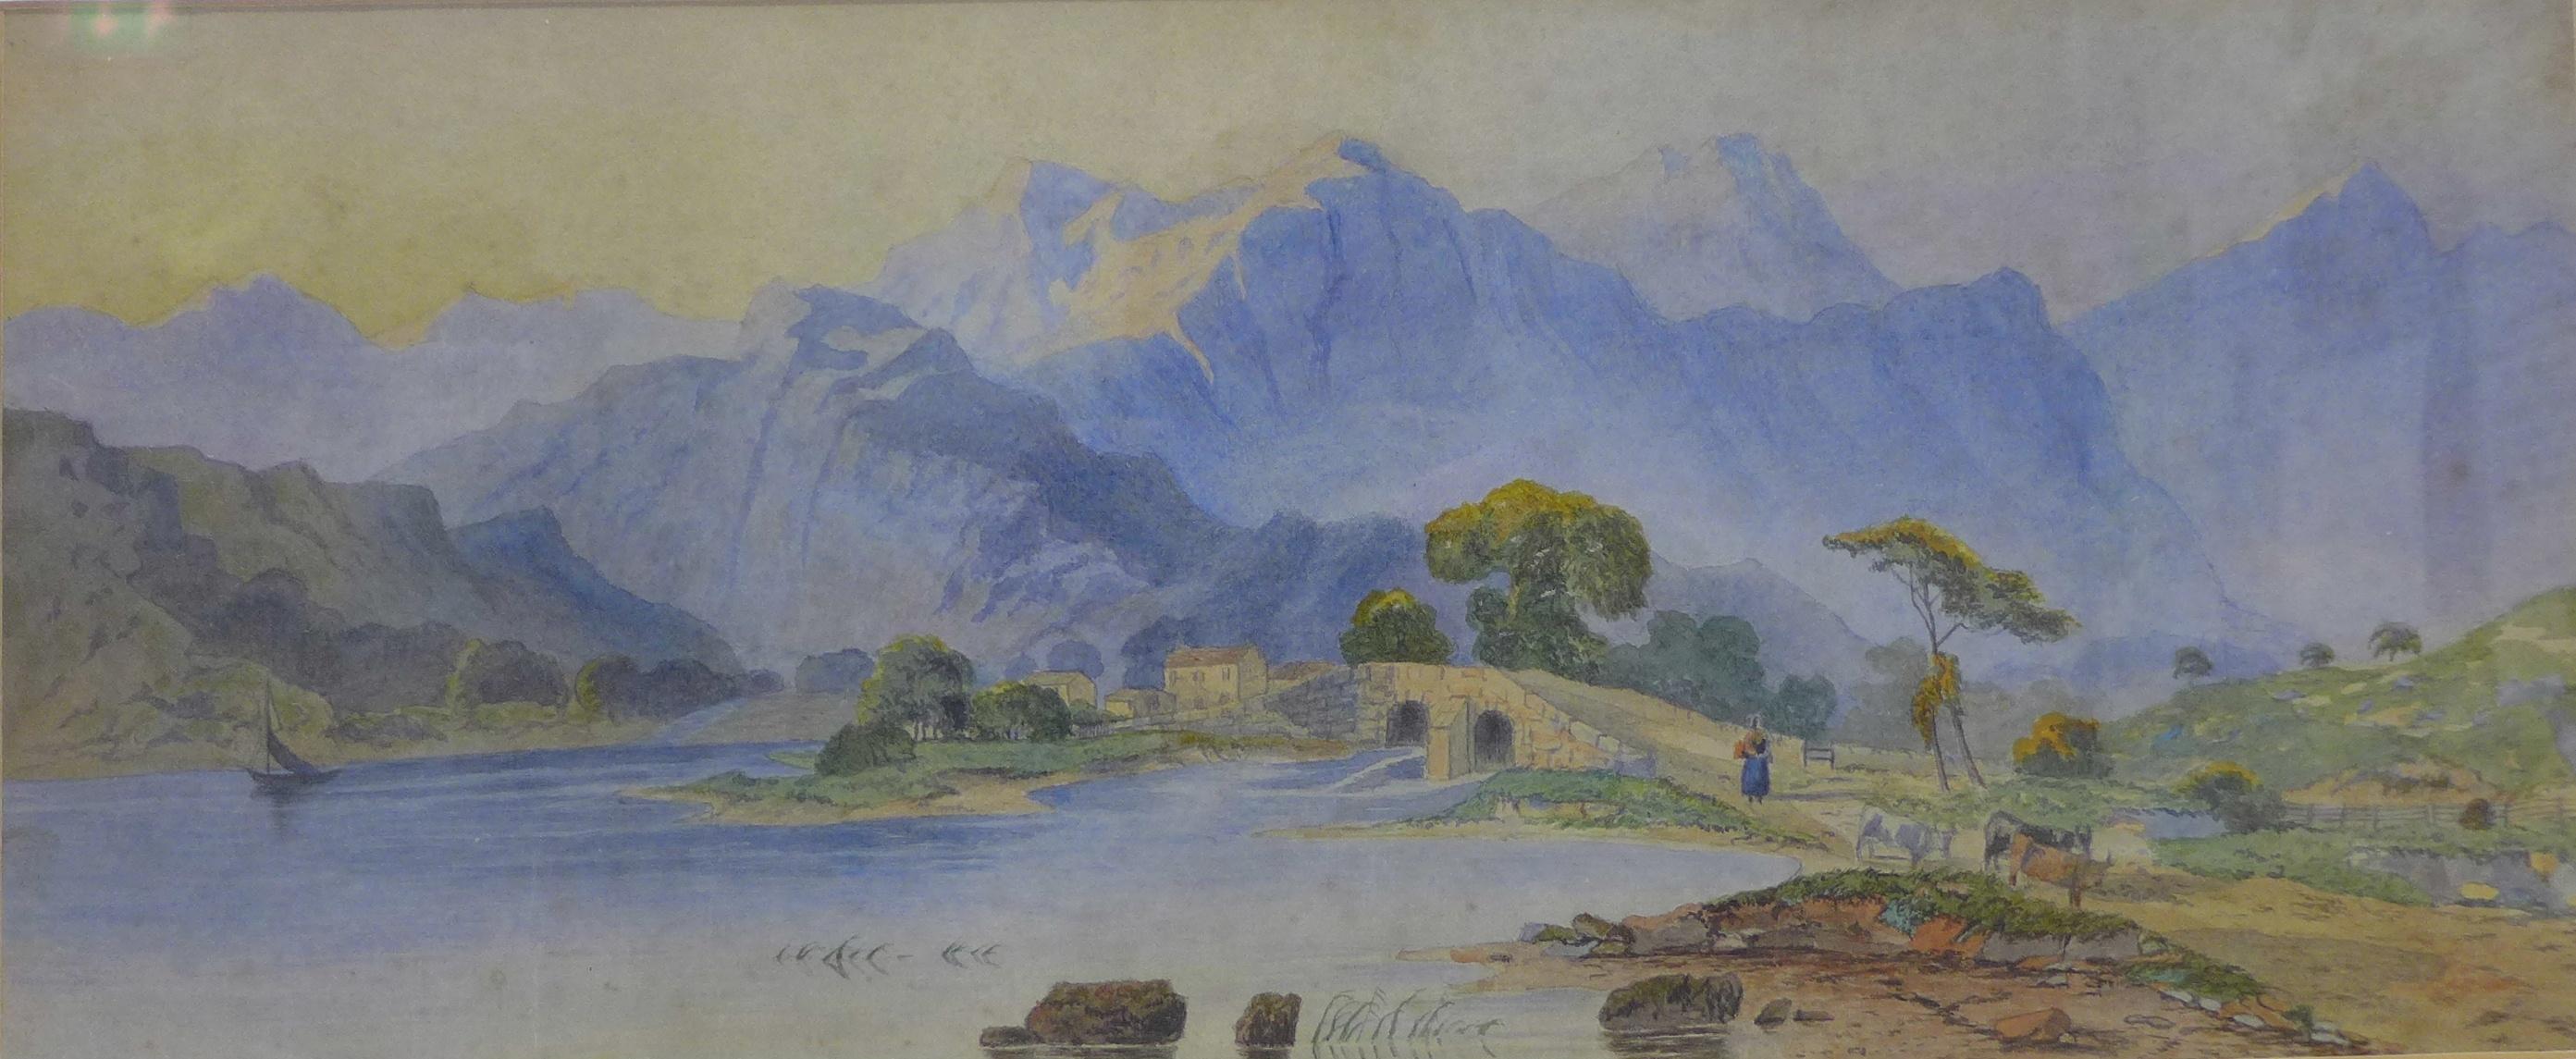 Continental School, Alpine landscape, watercolour, 18 x 44cms,